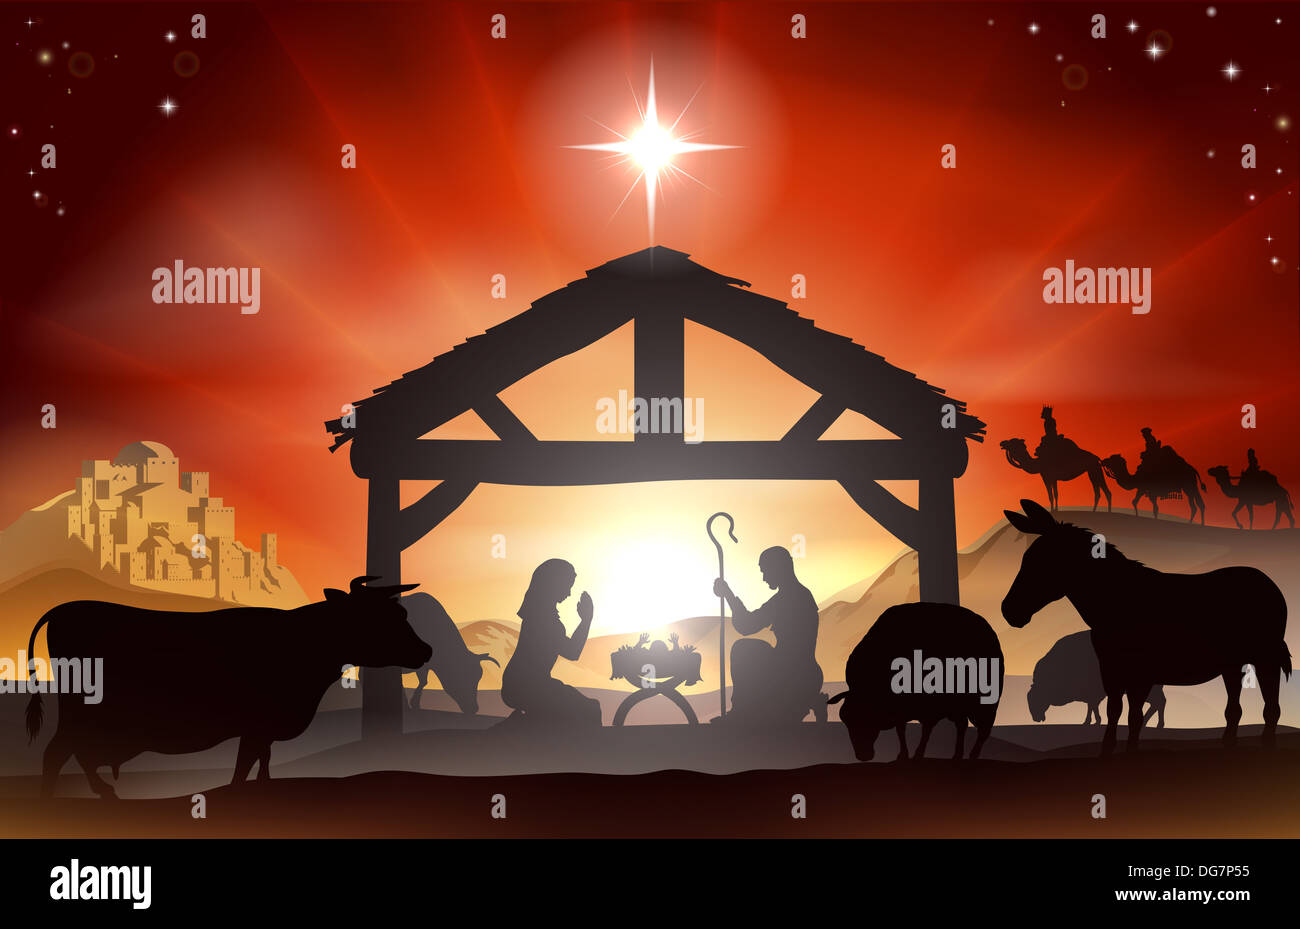 christmas christian nativity scene with baby jesus in manger in